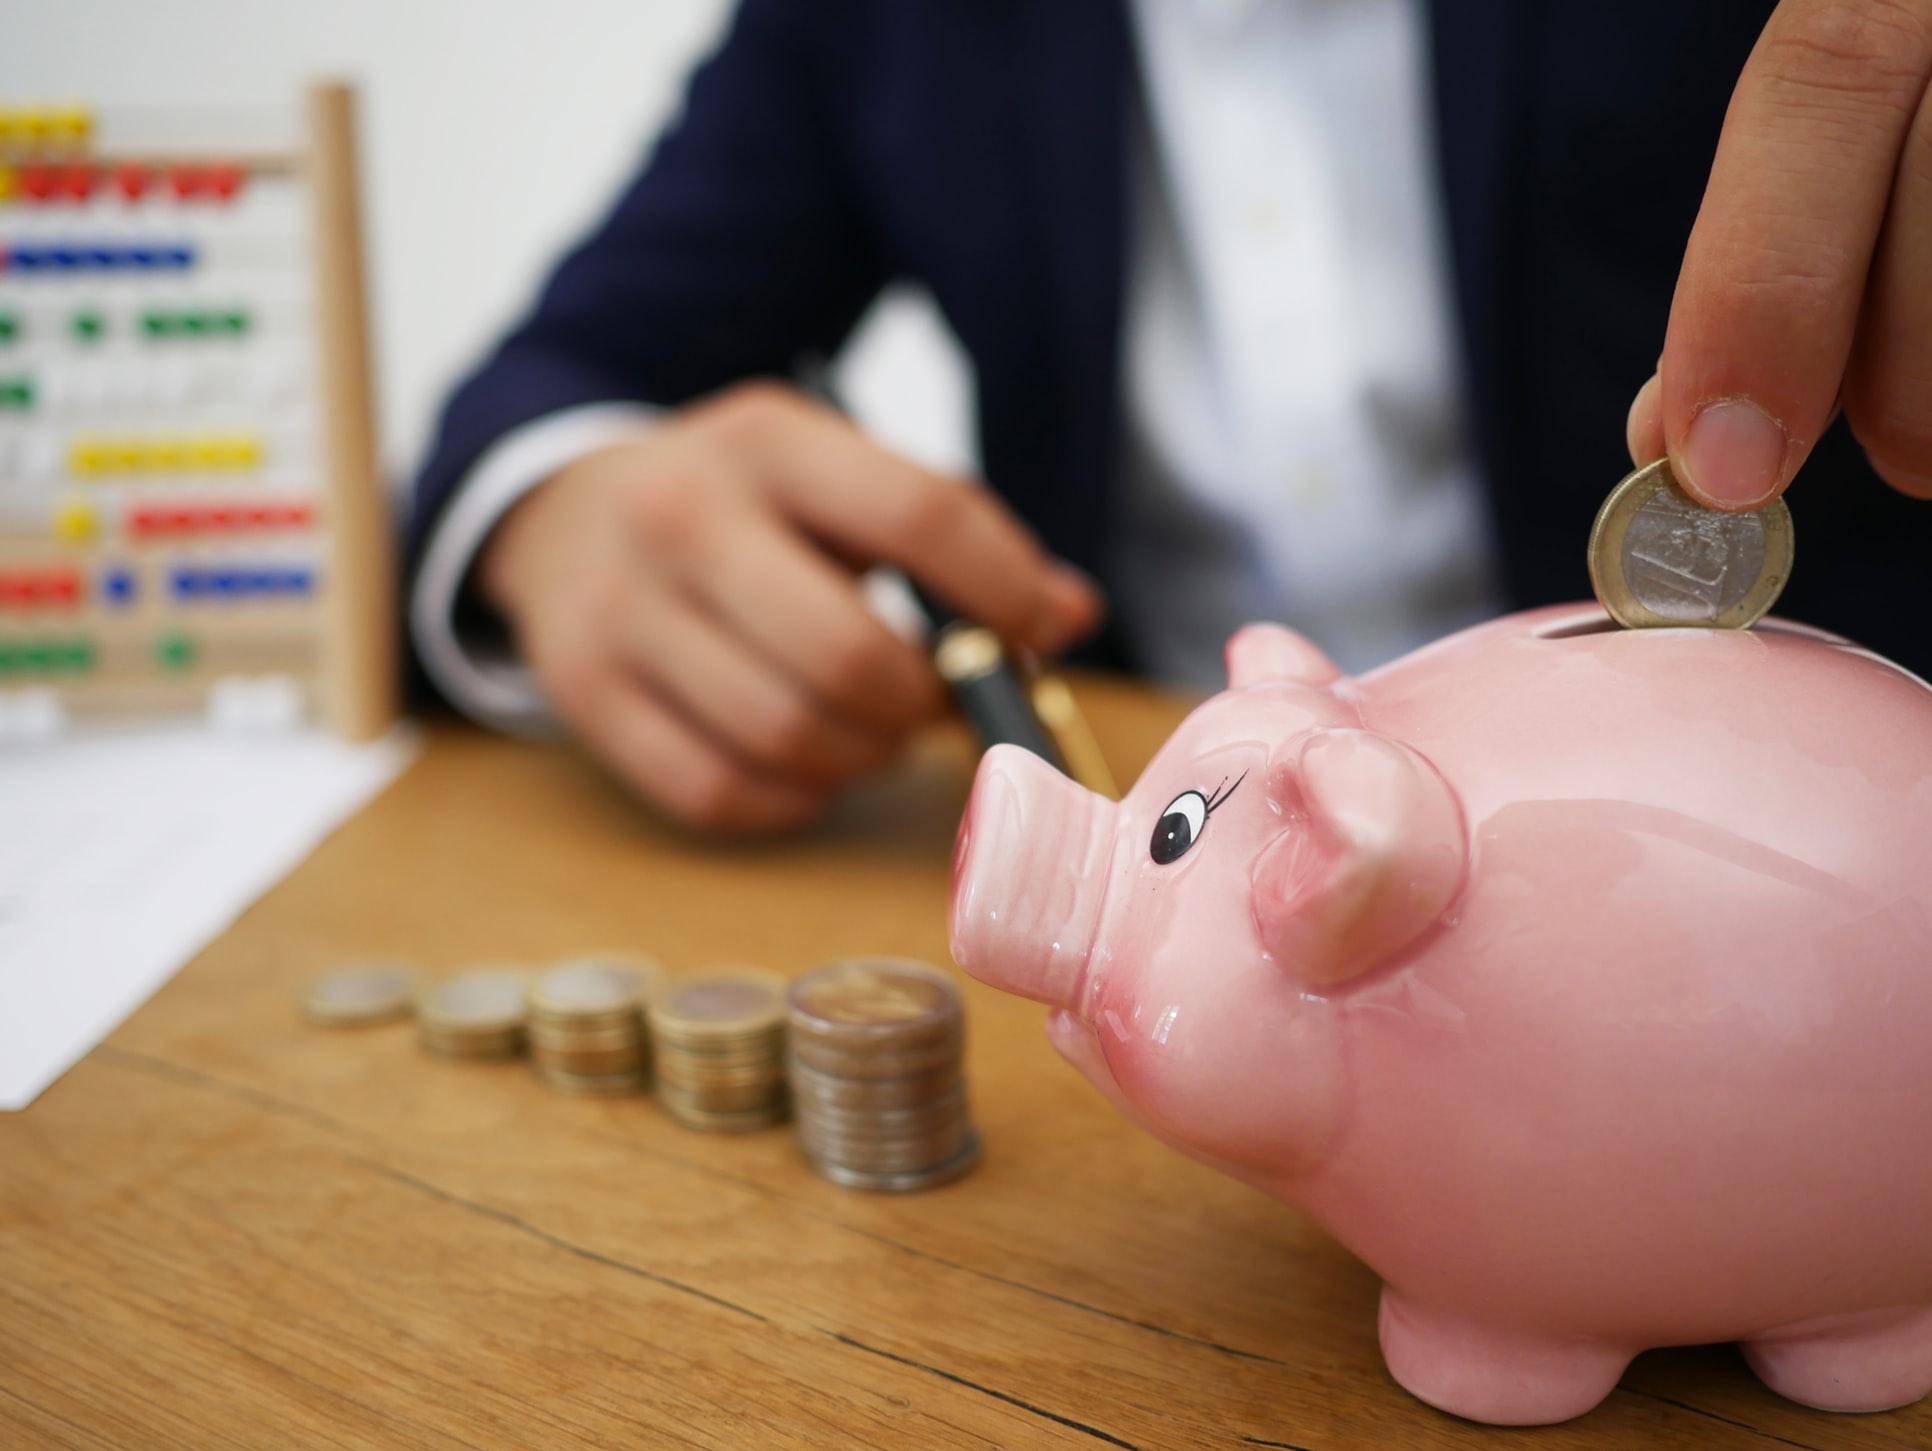 Close up of a man putting change into a piggy bank.